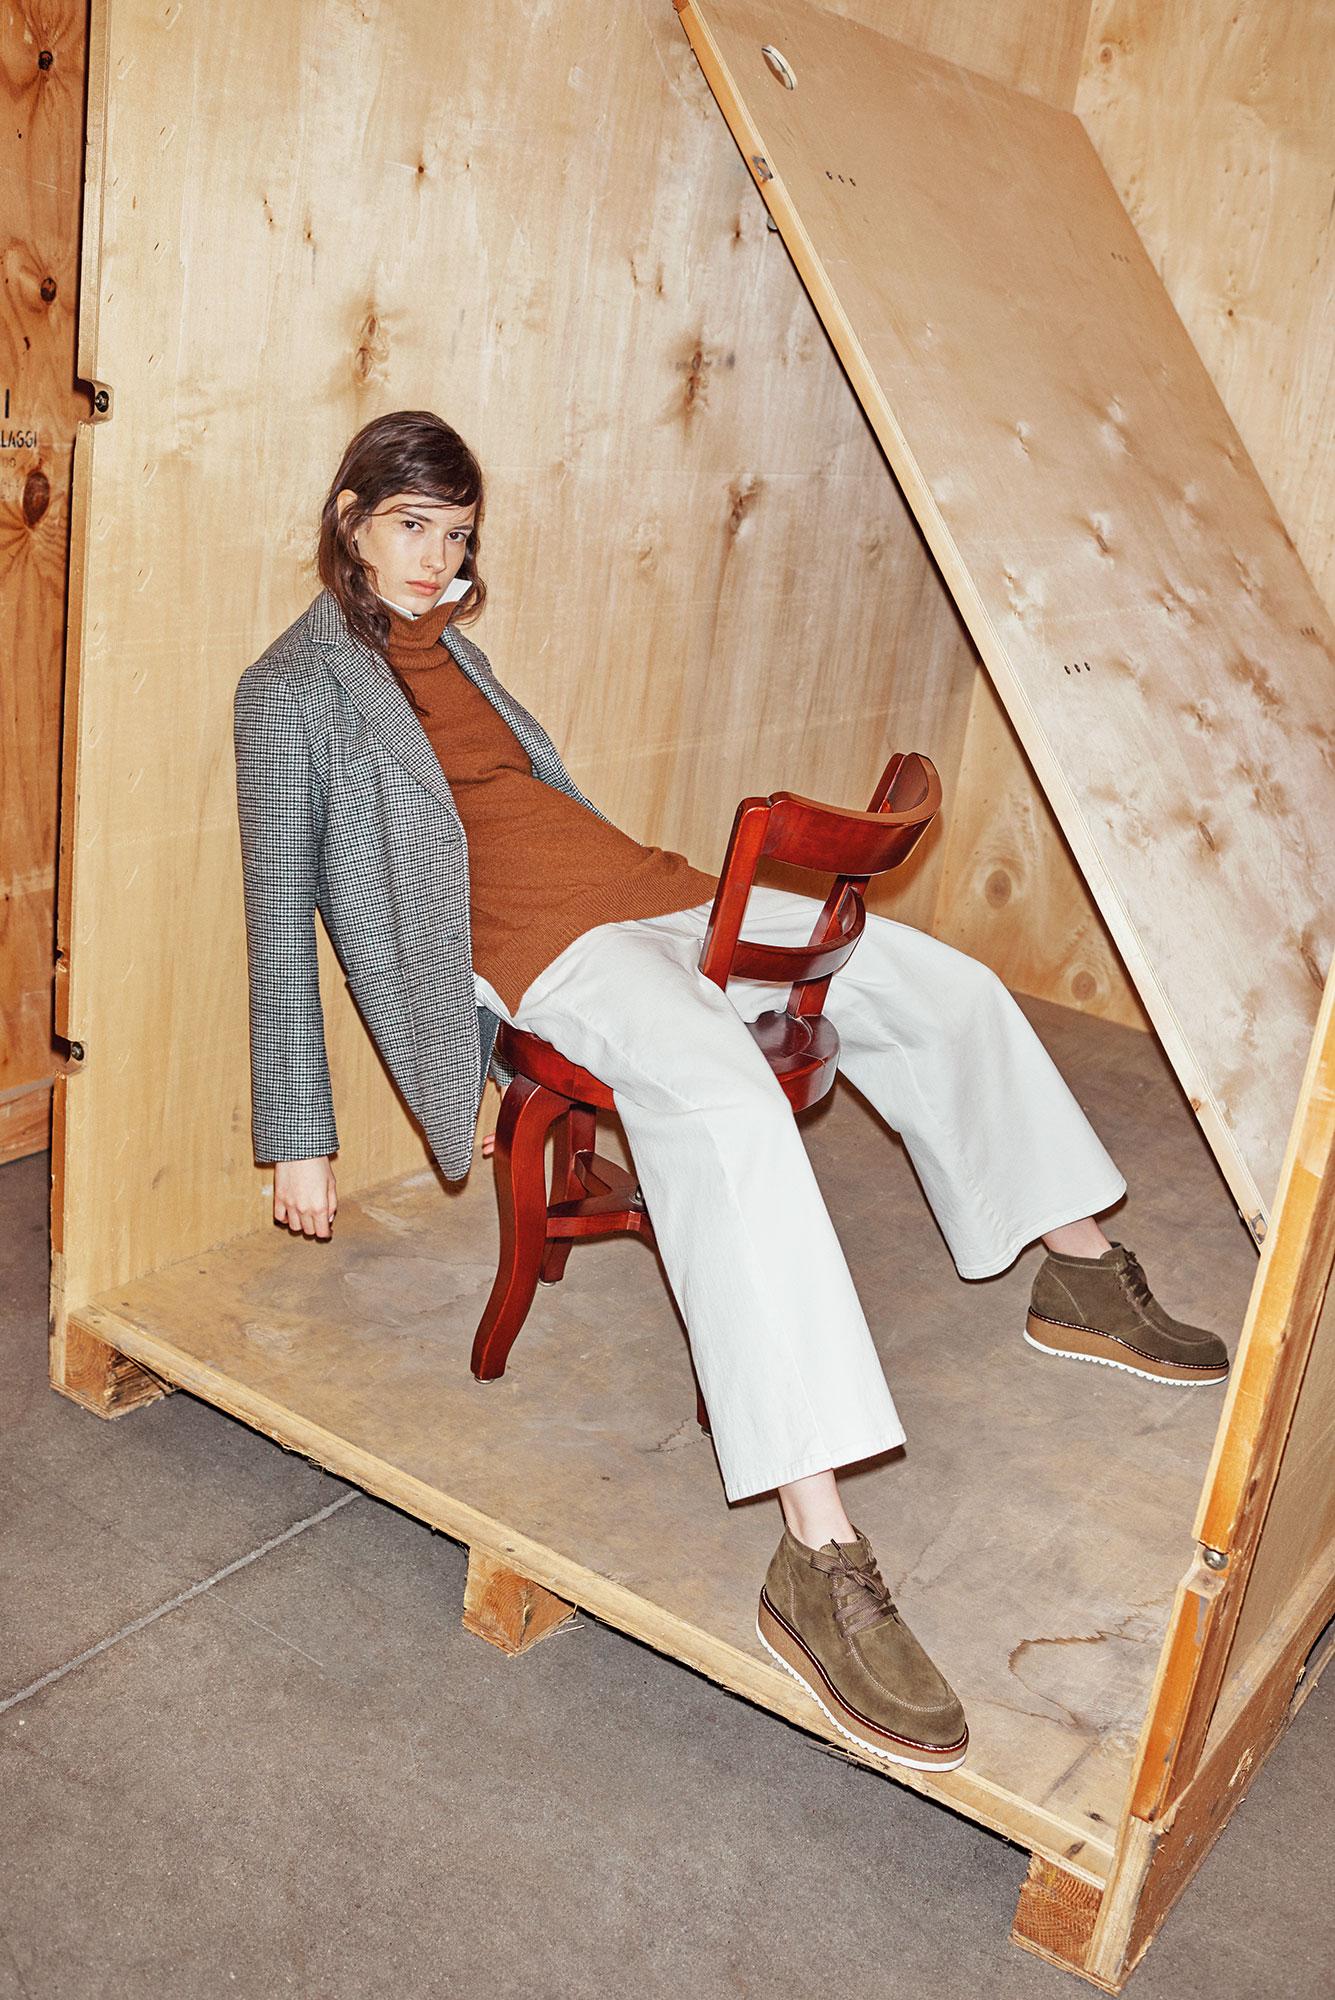 Max Mara Lookbook FW 18 | Marco Pietracupa | Viviana Volpicella | Numerique Retouch Photo Retouching Studio